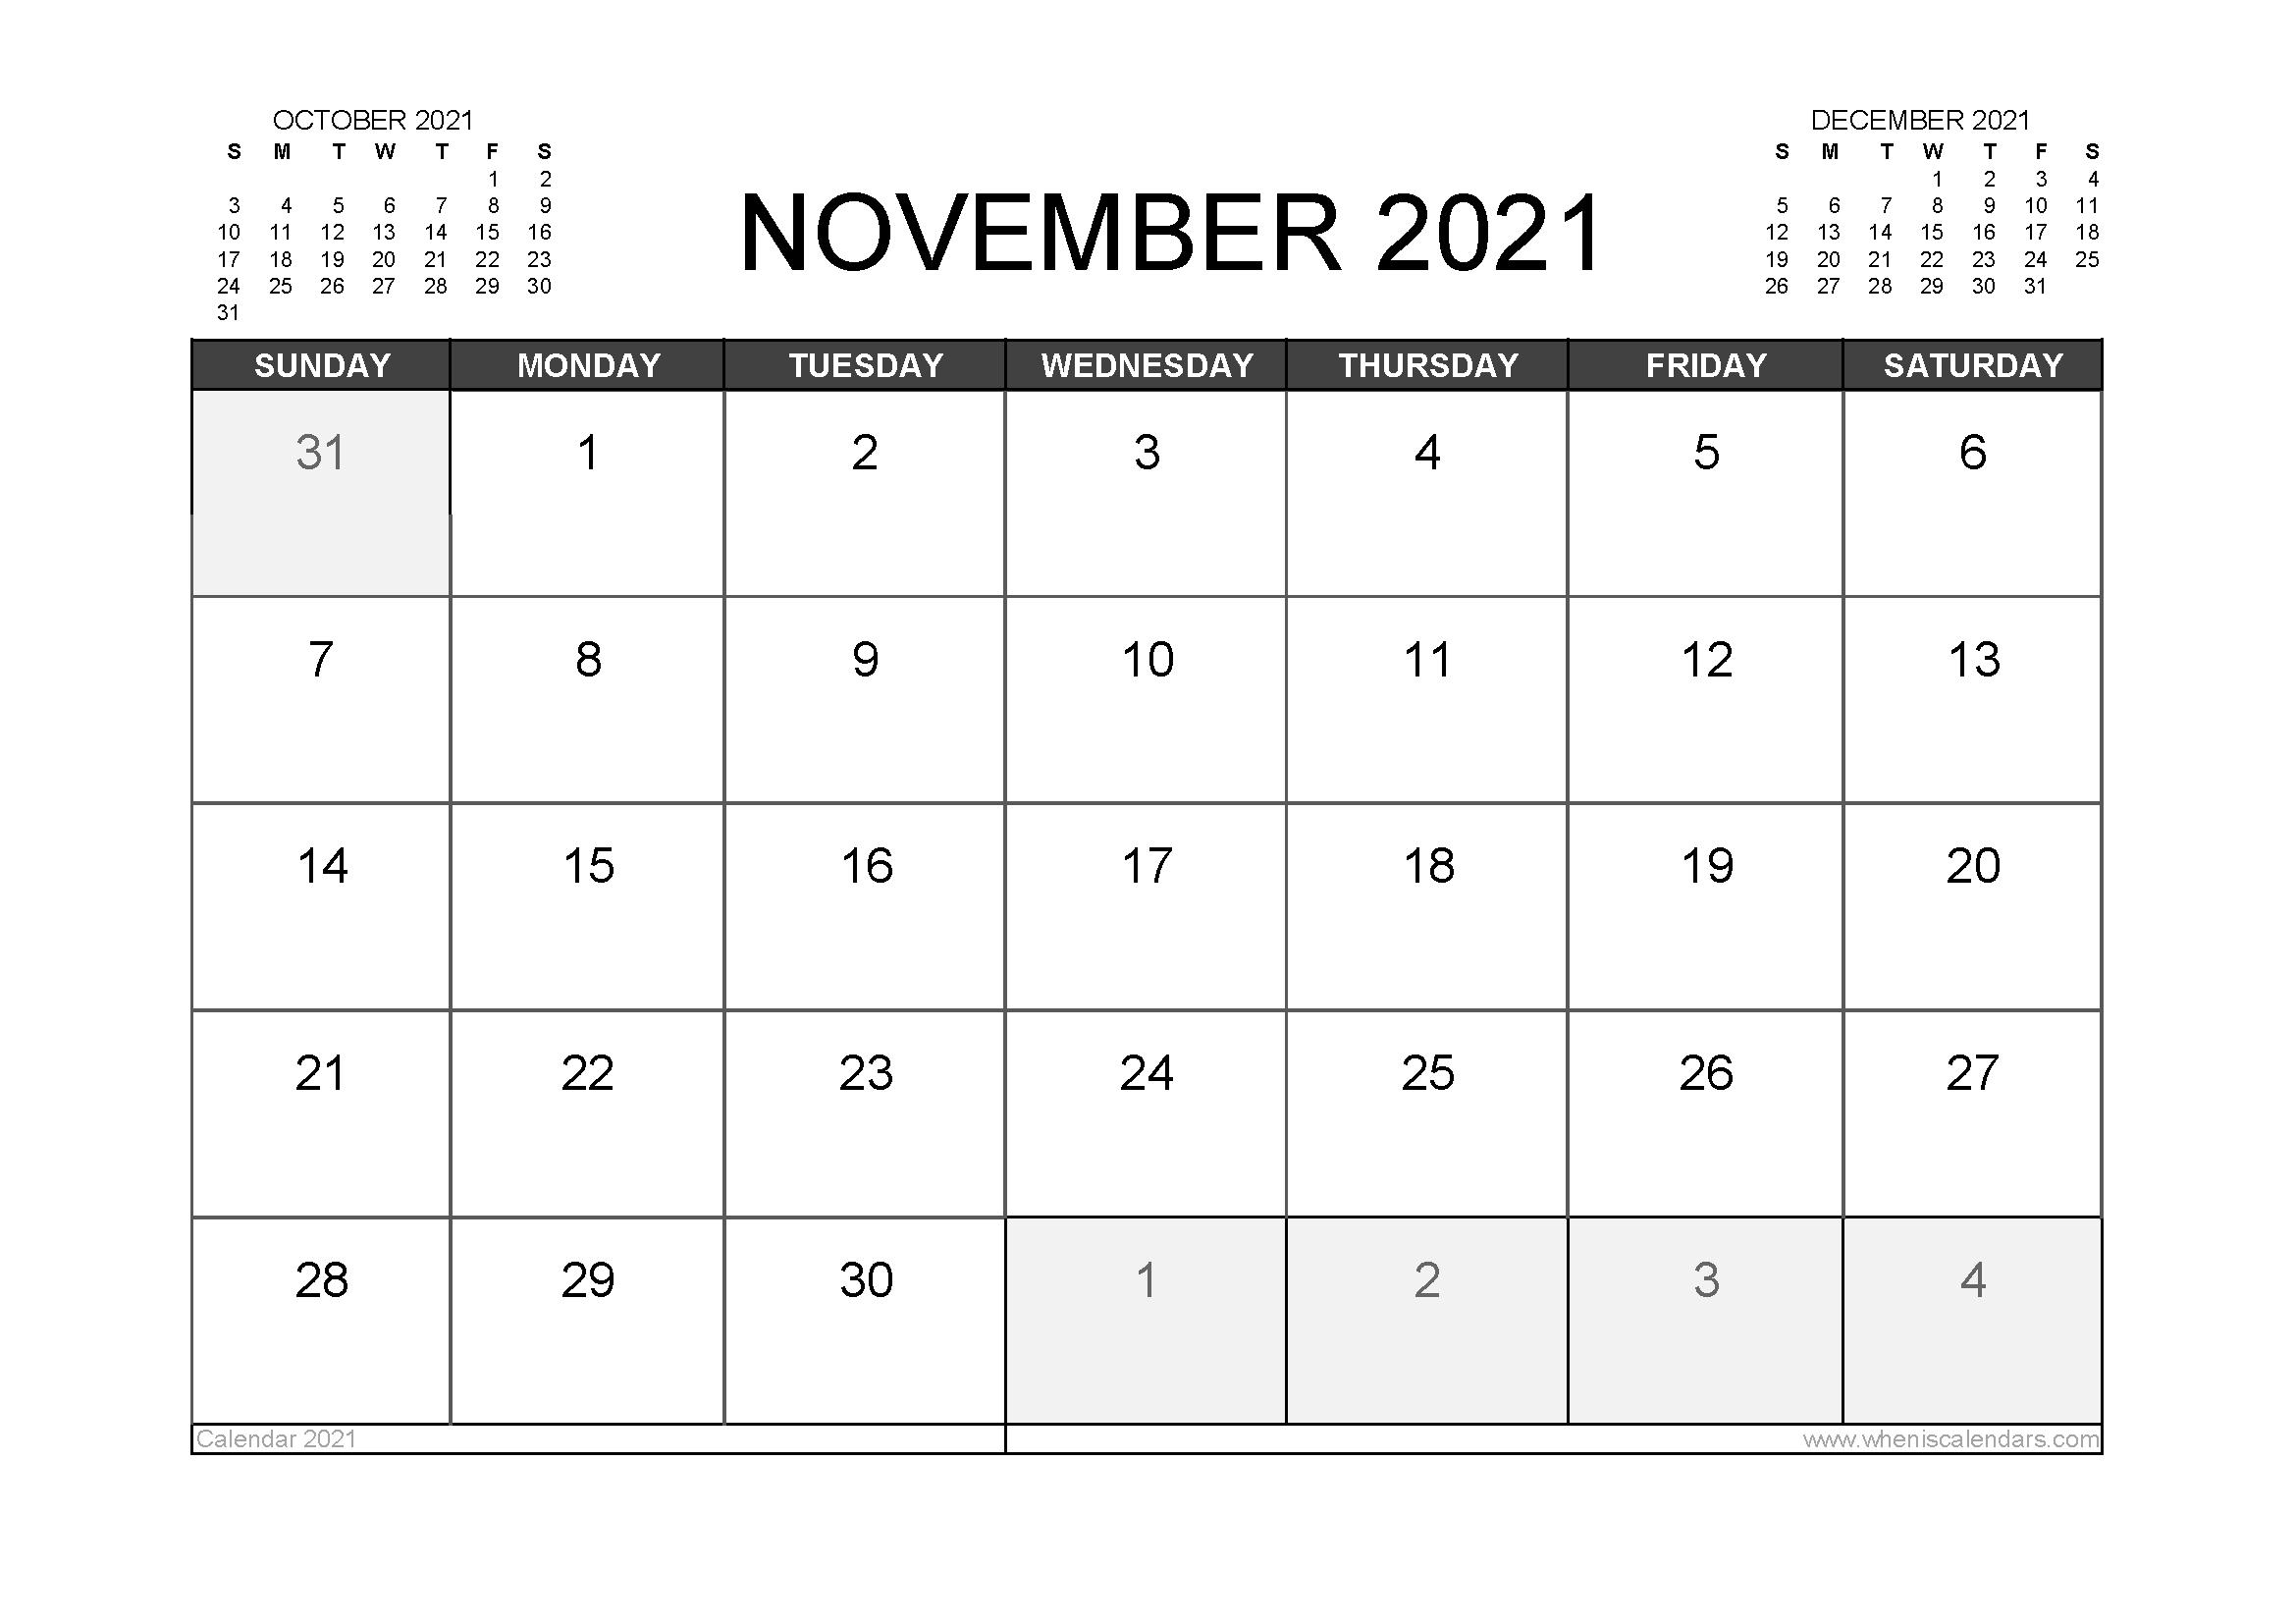 November 2021 Calendar Australia With Holidays December 2020 January 2021 Calendar Australia